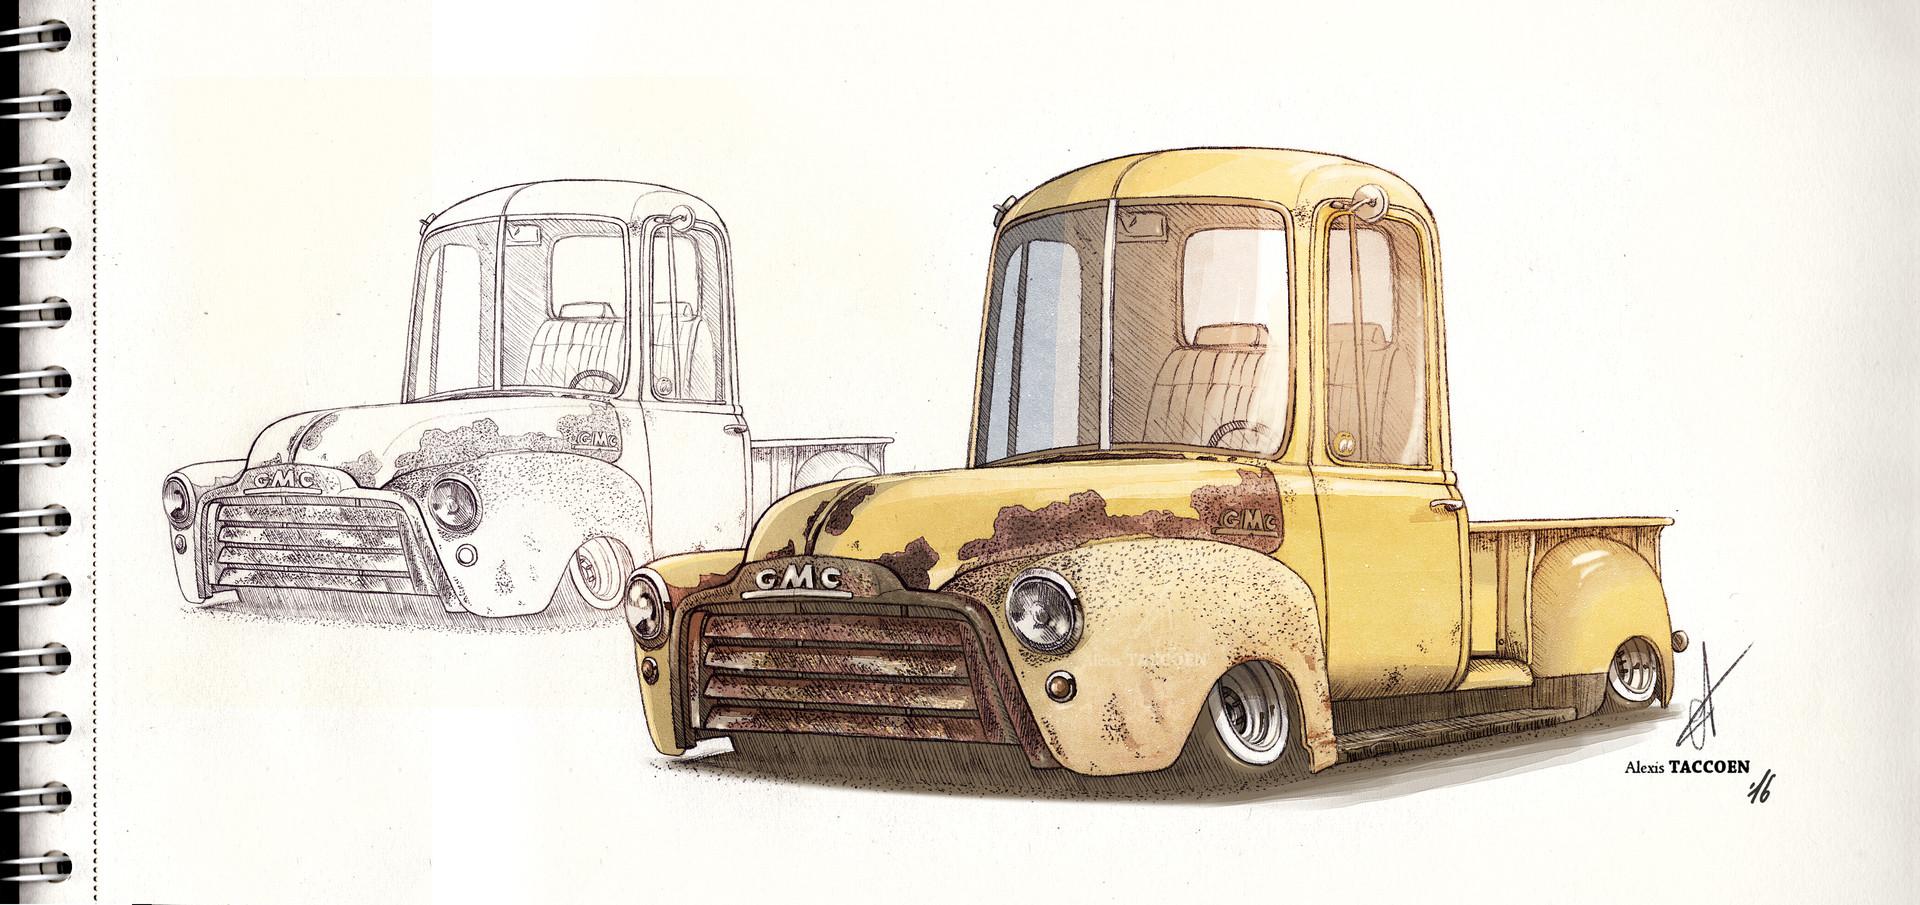 Alexis taccoen gmc pickup 53 sketch